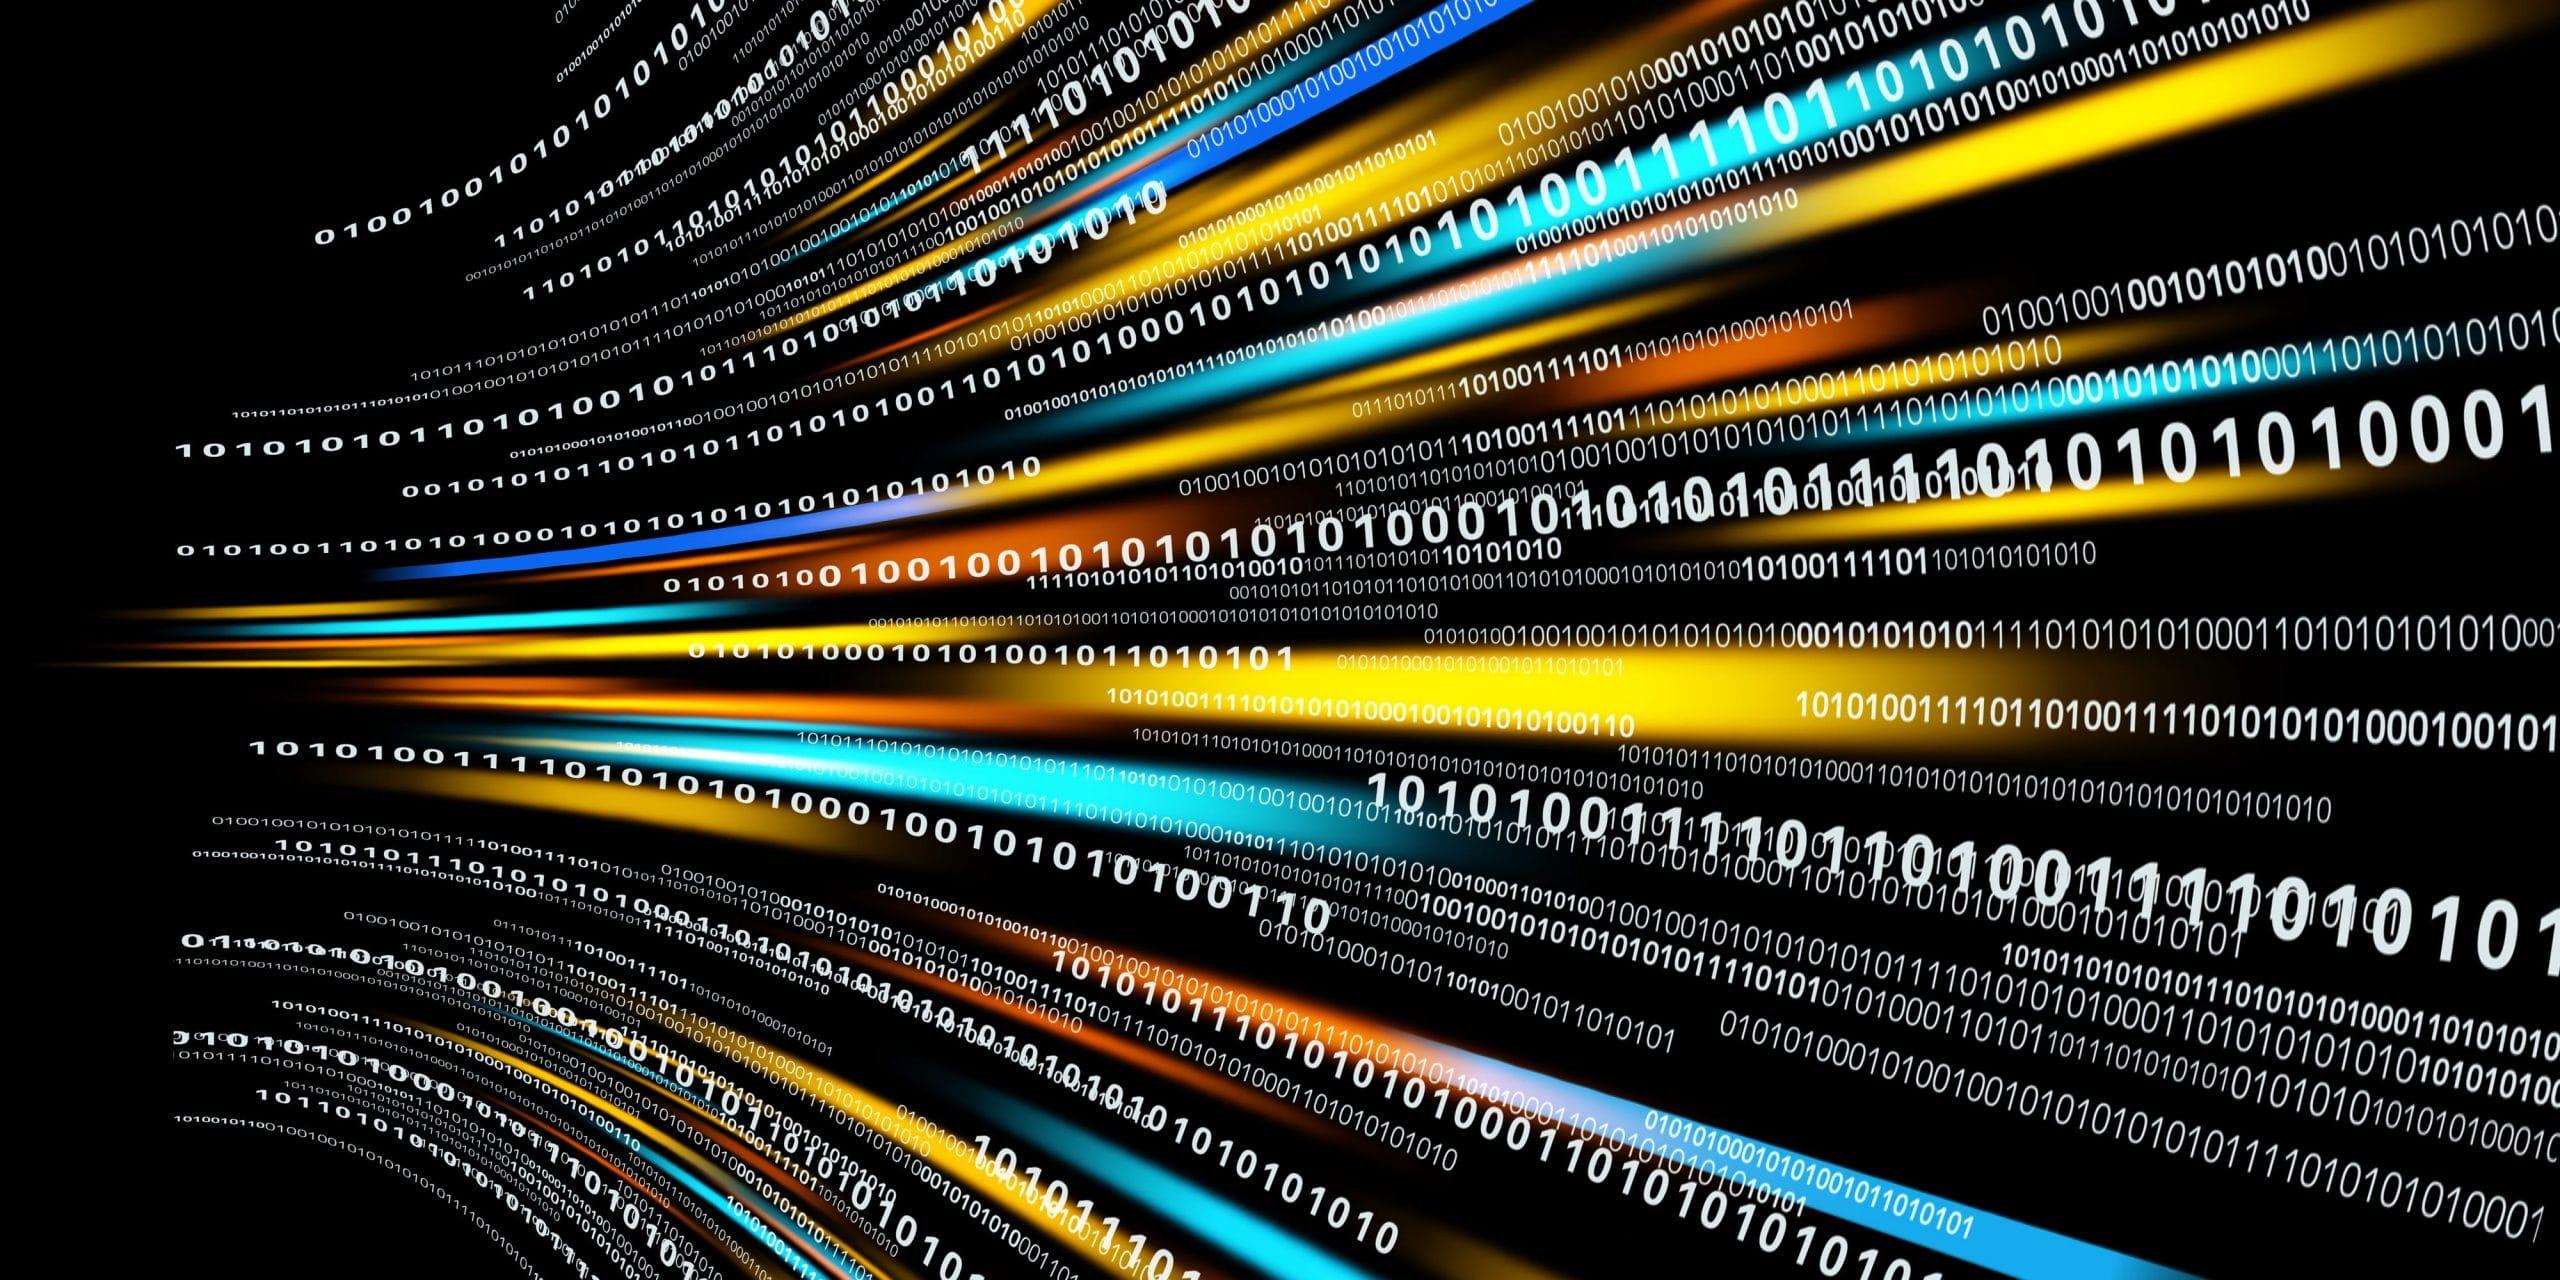 CDNとは?概要からメリット・デメリット、セキュリティ対策としての利用方法まで解説